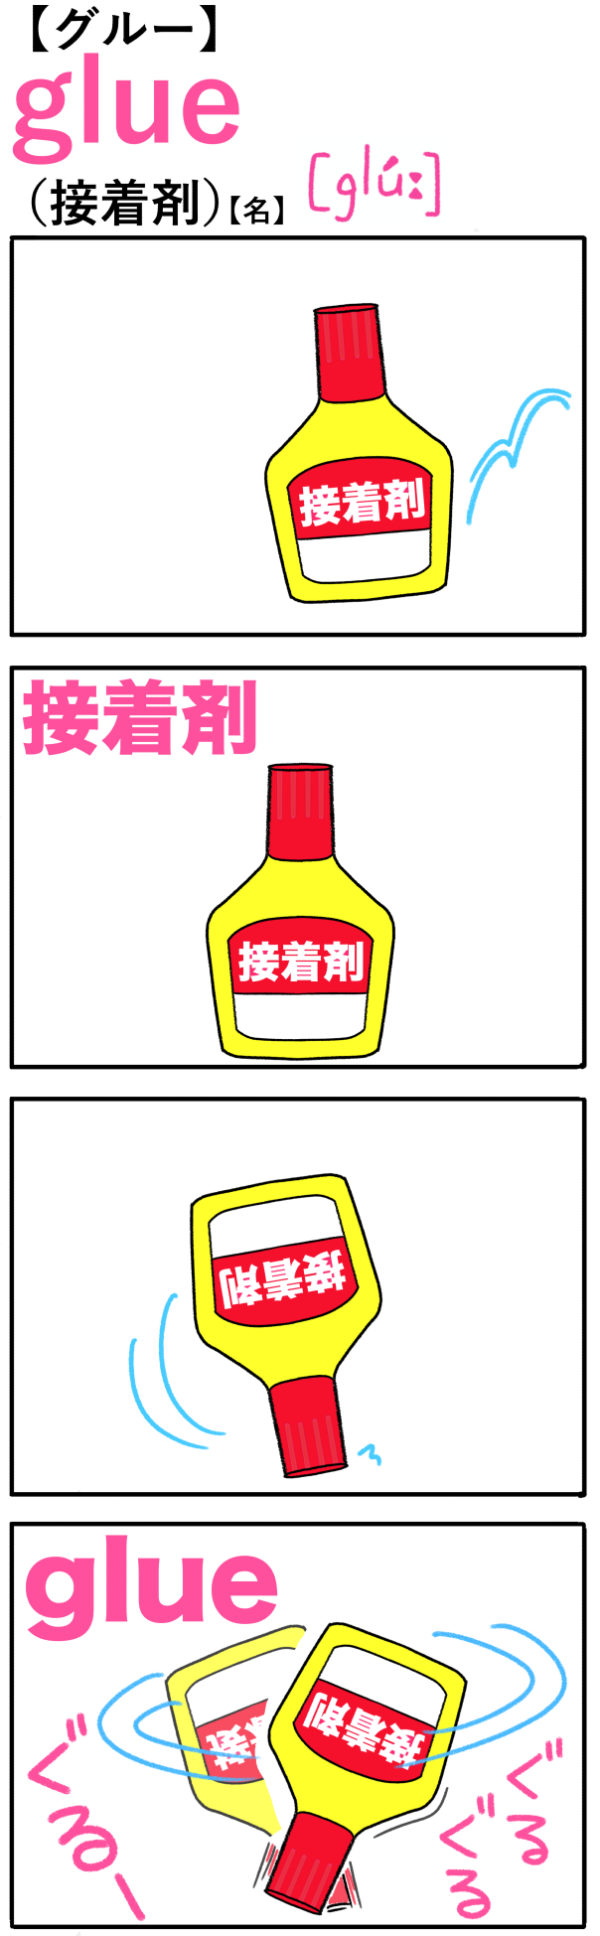 glue(接着剤)の語呂合わせ英単語